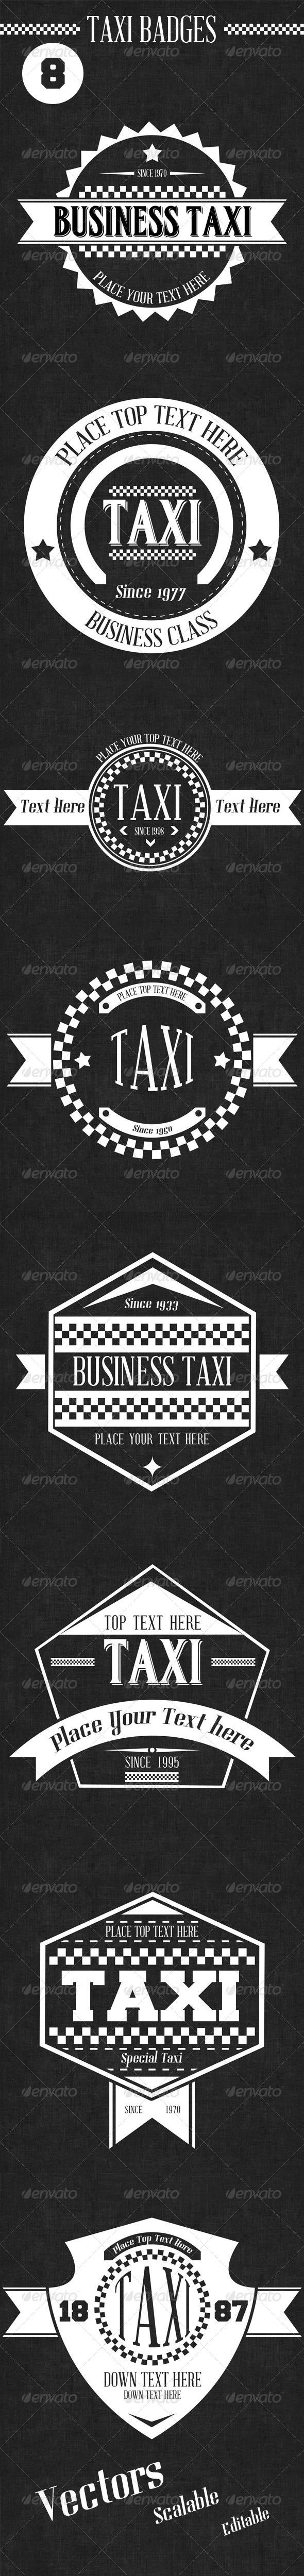 8 Retro Taxi Badges - Badges & Stickers Web Elements